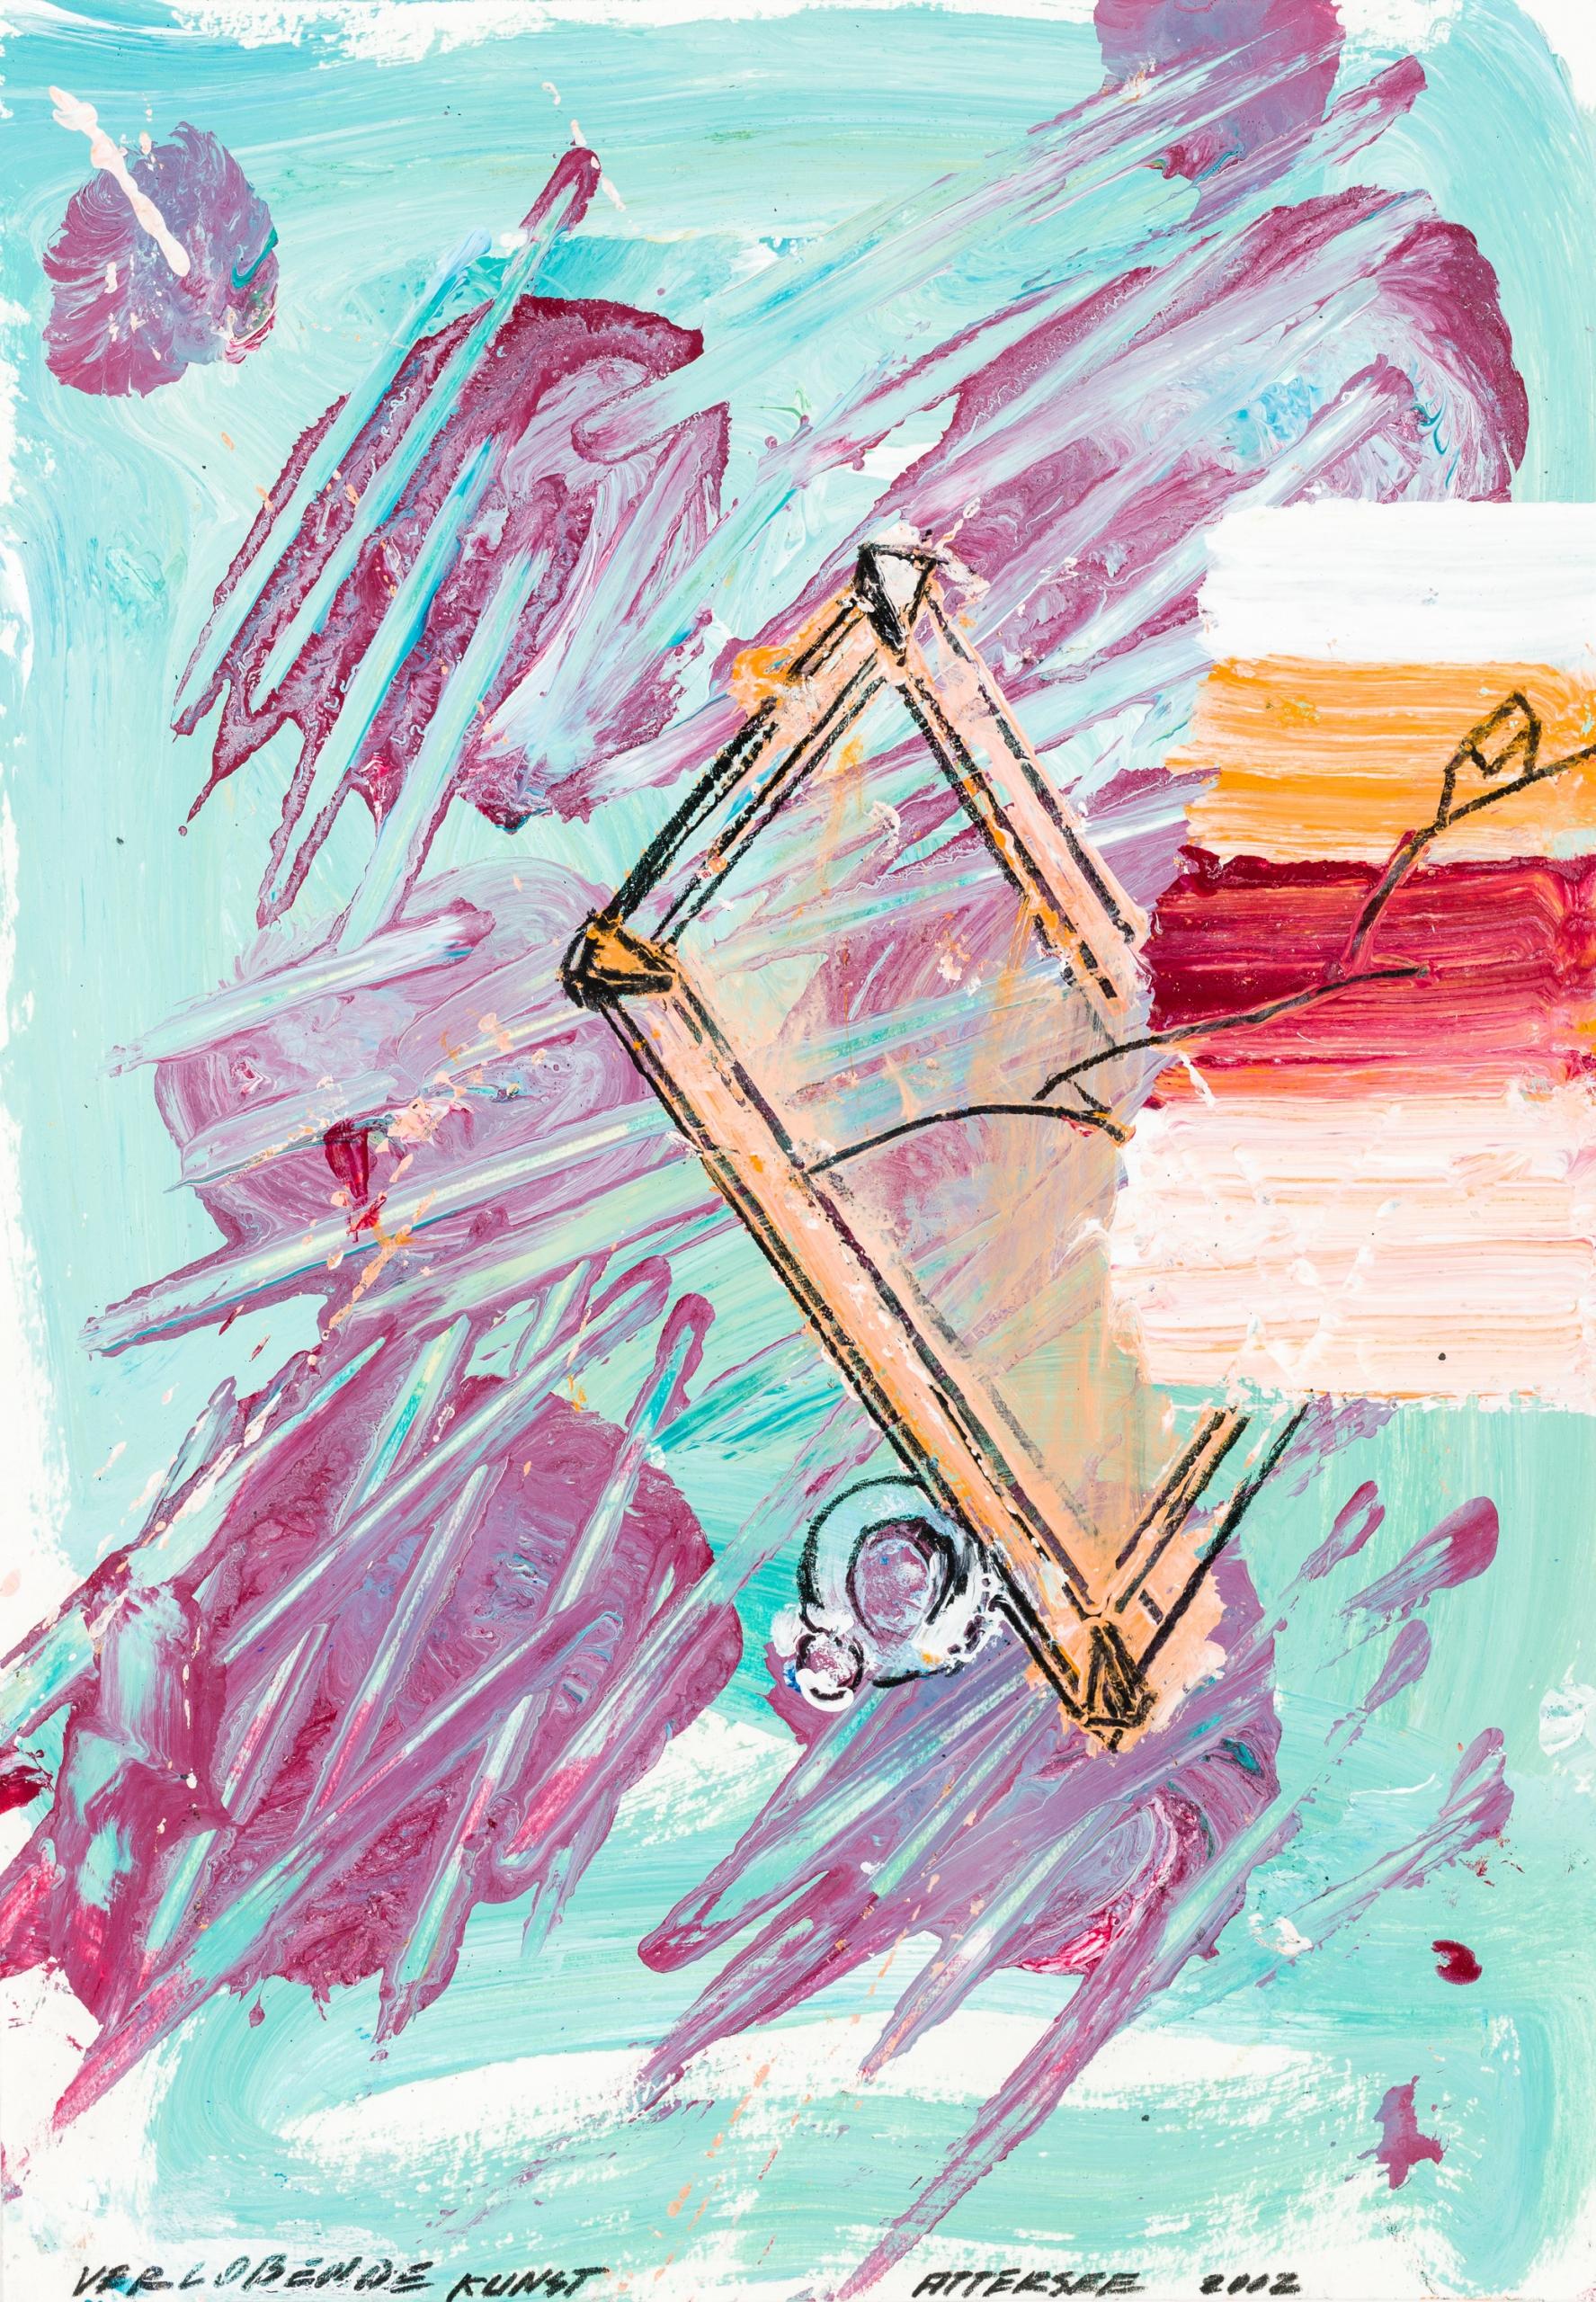 Christian Ludwig Attersee, Verlobende Kunst